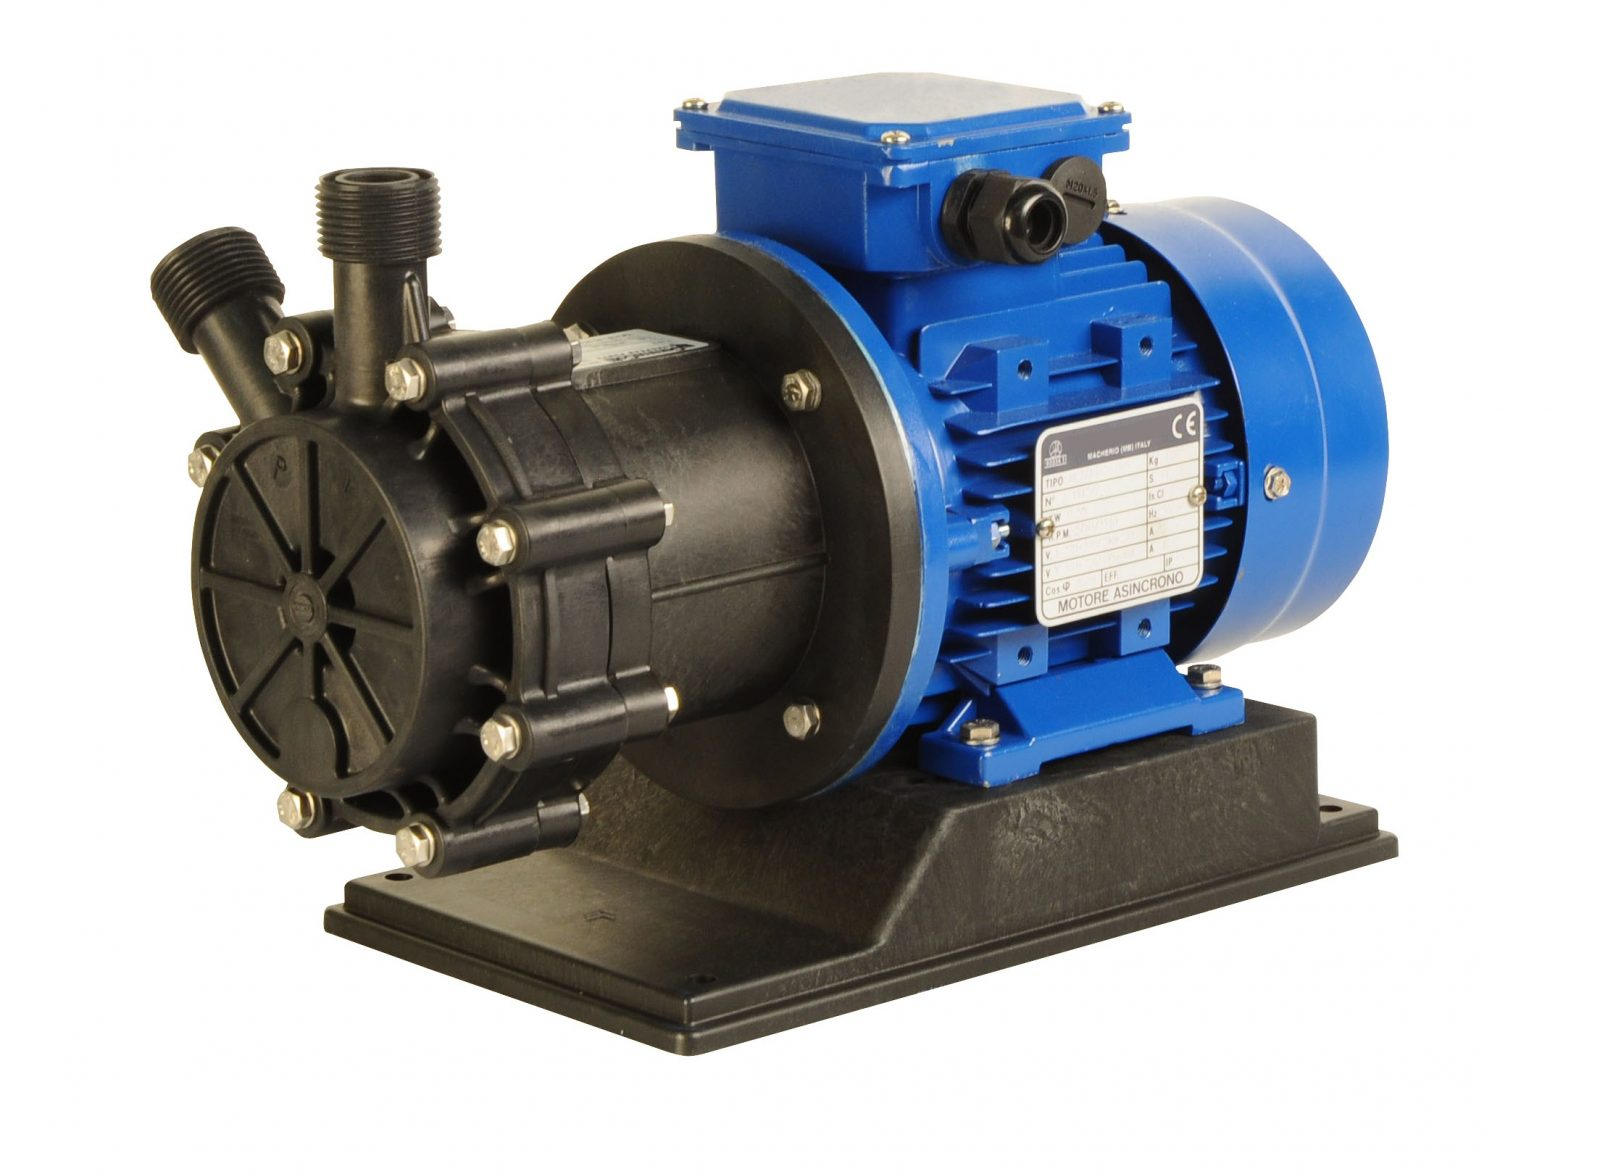 Magnetically Driven Regenerative Turbine Pump - TMP